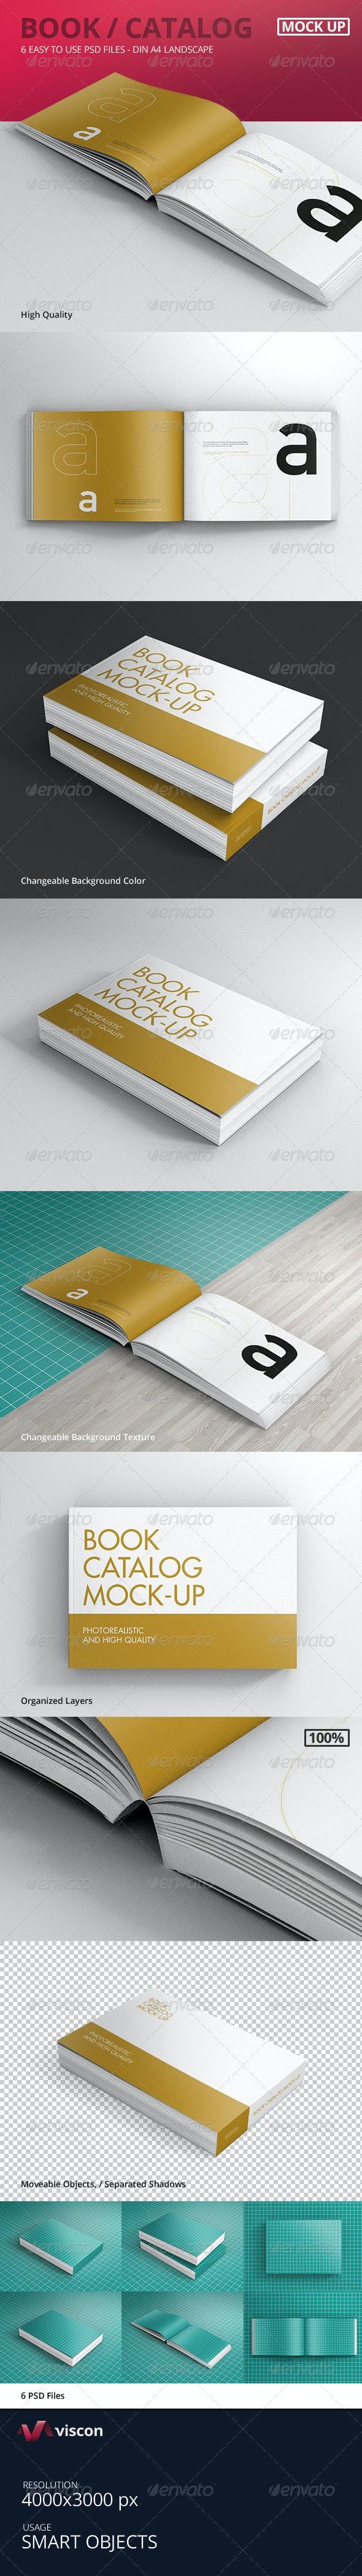 Book / Catalog Mock-Ups Landscape - Books Print